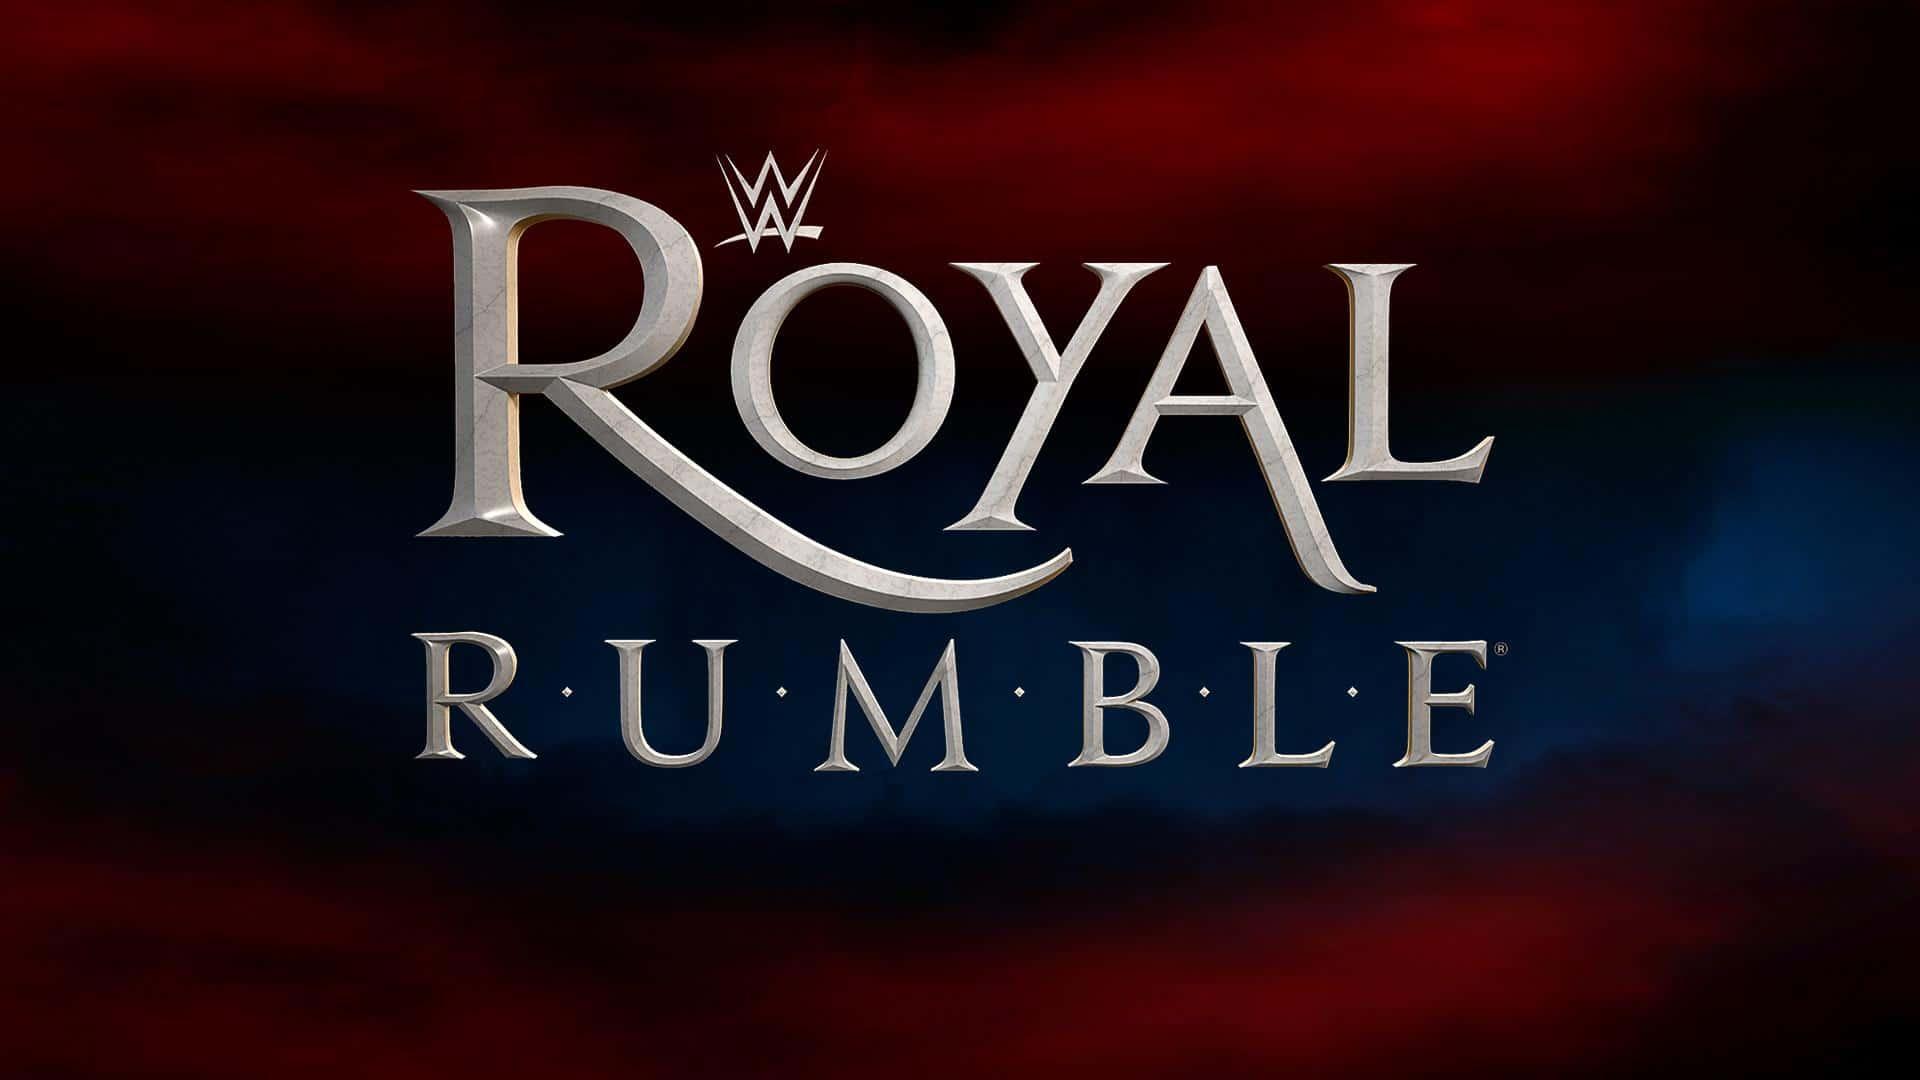 20160930_royalrumble_tickets_v2-9fea8ce009abce752d43b15676c64c57